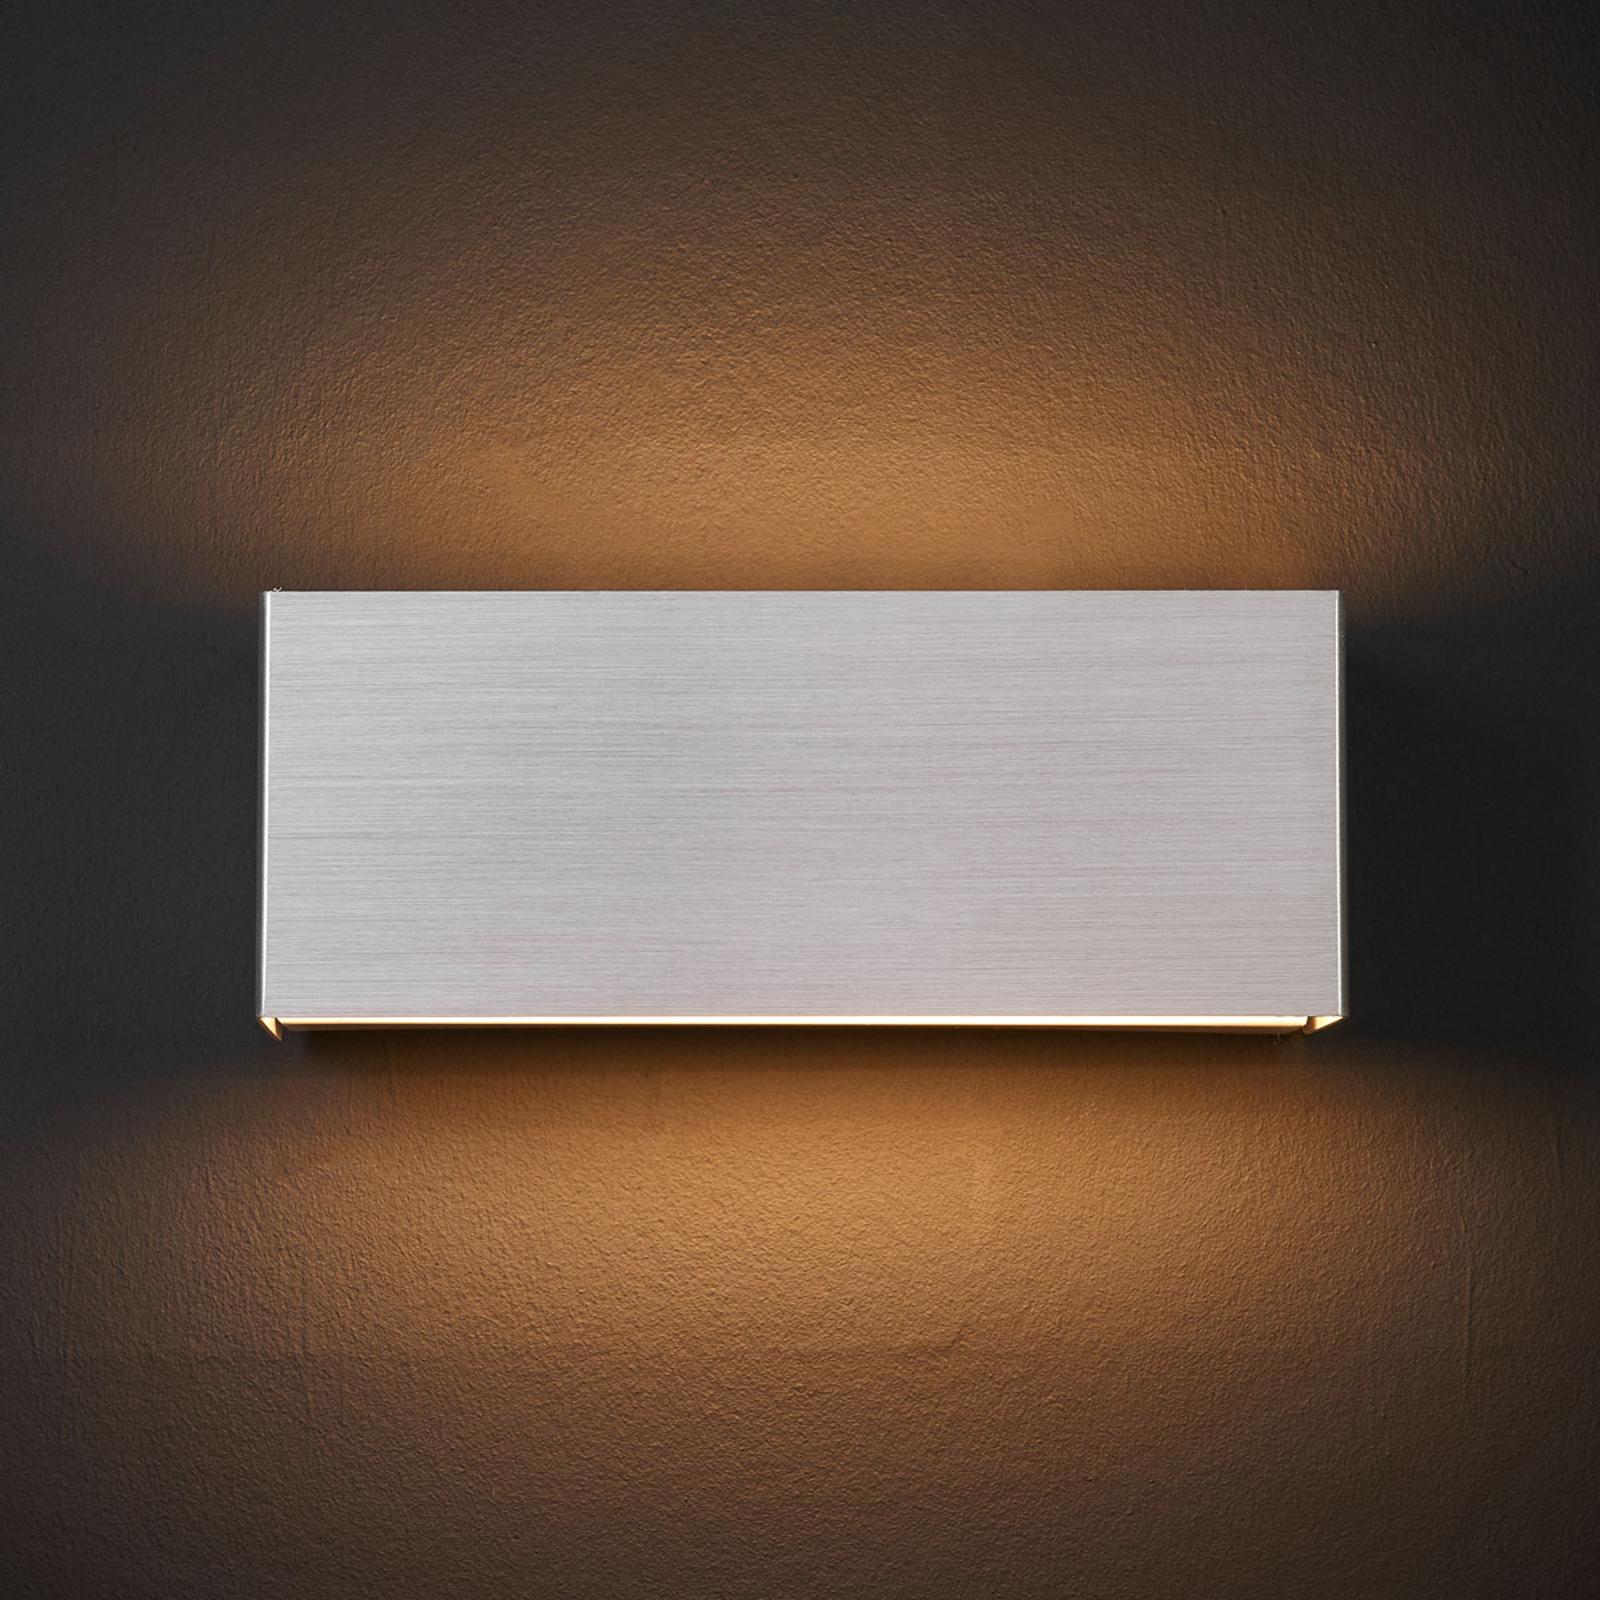 LED-seinälamppu Kimberly, 23x9cm, alumiini